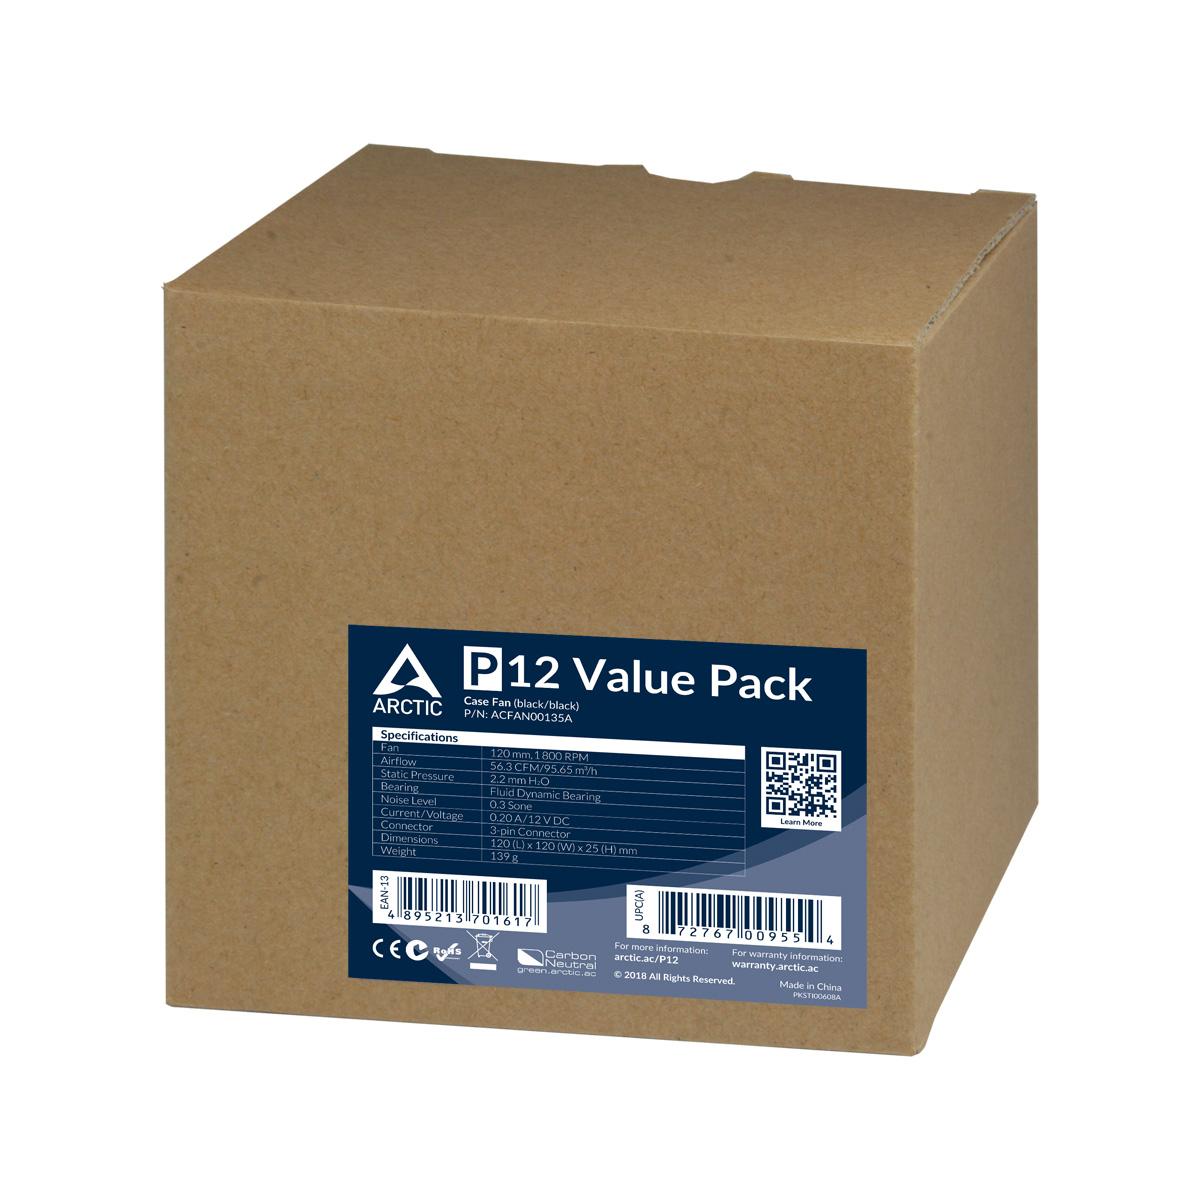 P12_Value_Pack_G05